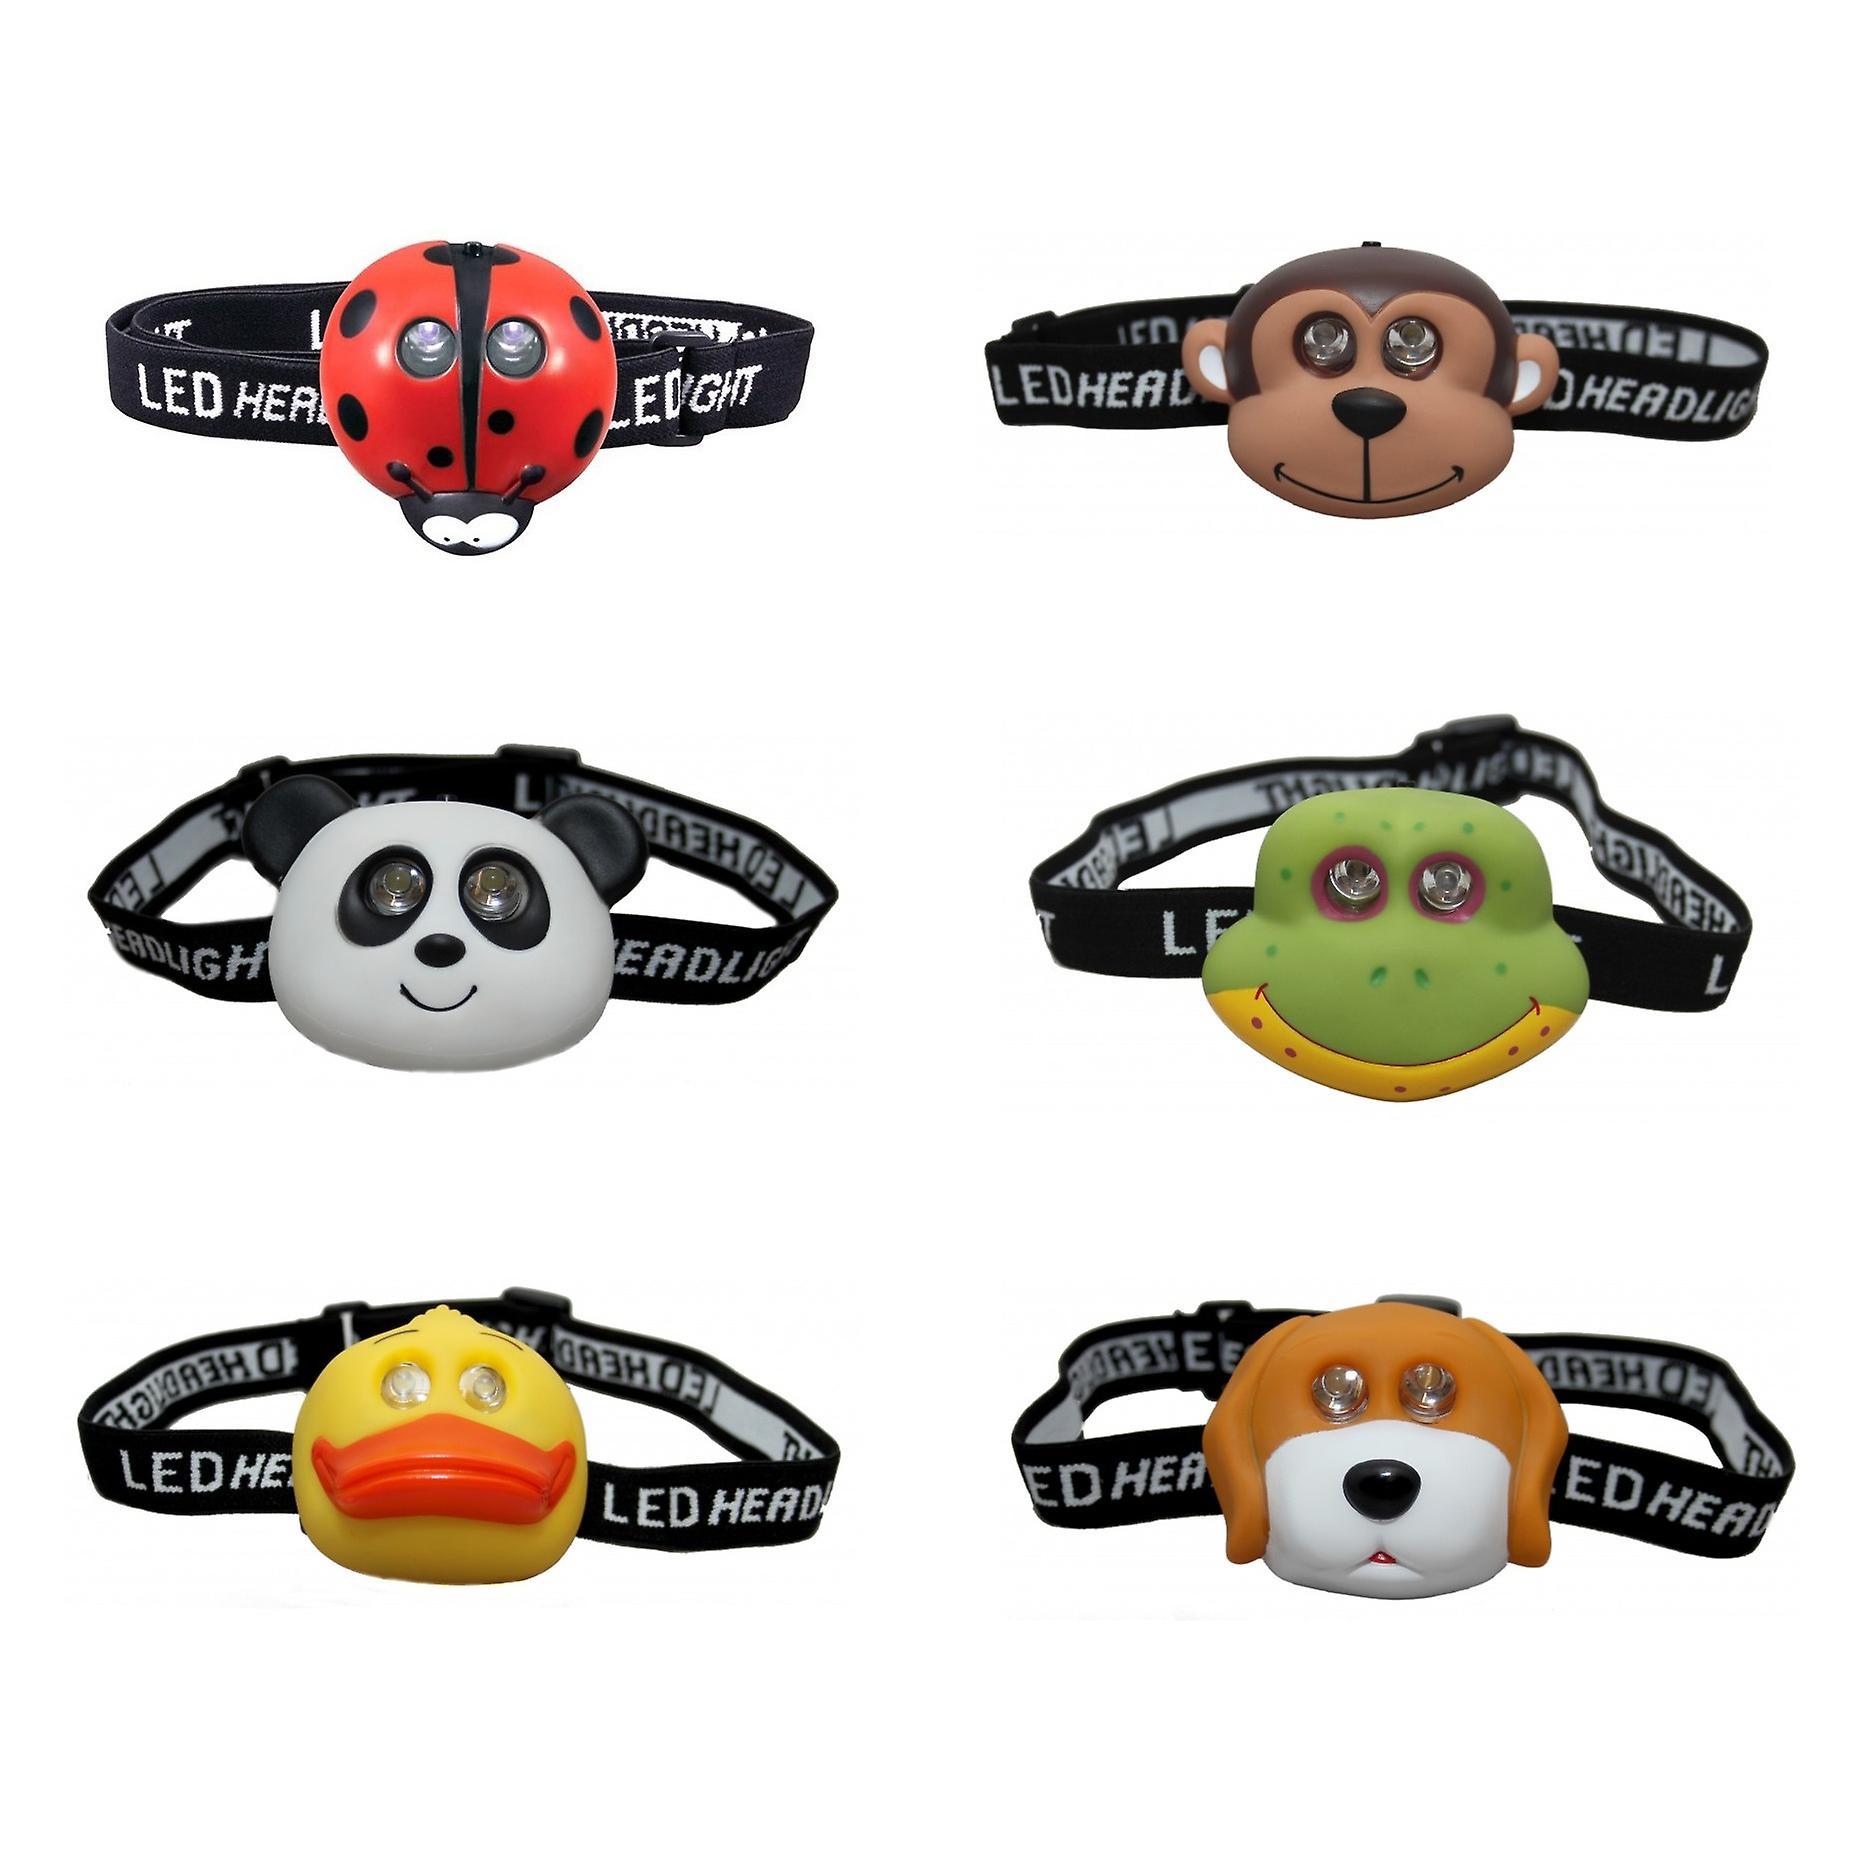 Clulite Kinder Tier LED Headtorch - Kinder Stirnlampe LED Taschenlampe Scheinwerfer